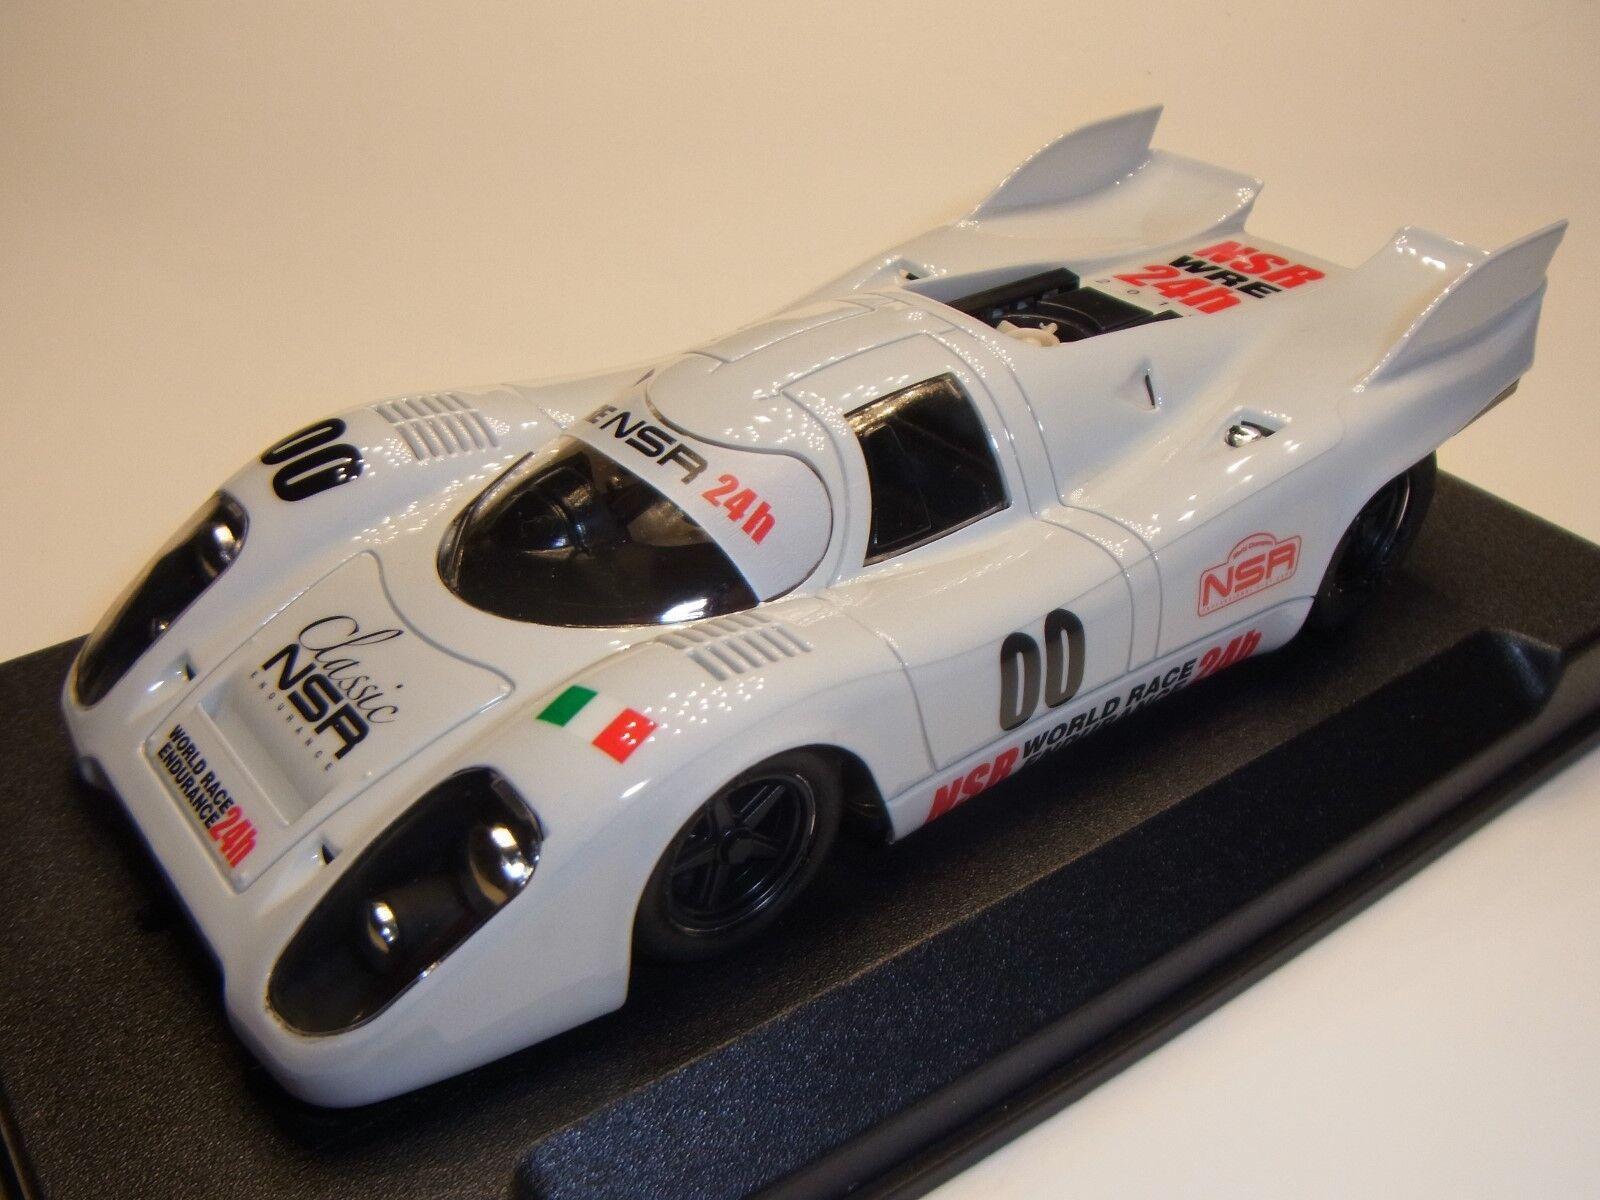 NSR Porsche 917 WR 24h 2014 per Slot auto Racing Track 1 3 2 Slotkar NSRWRE2014